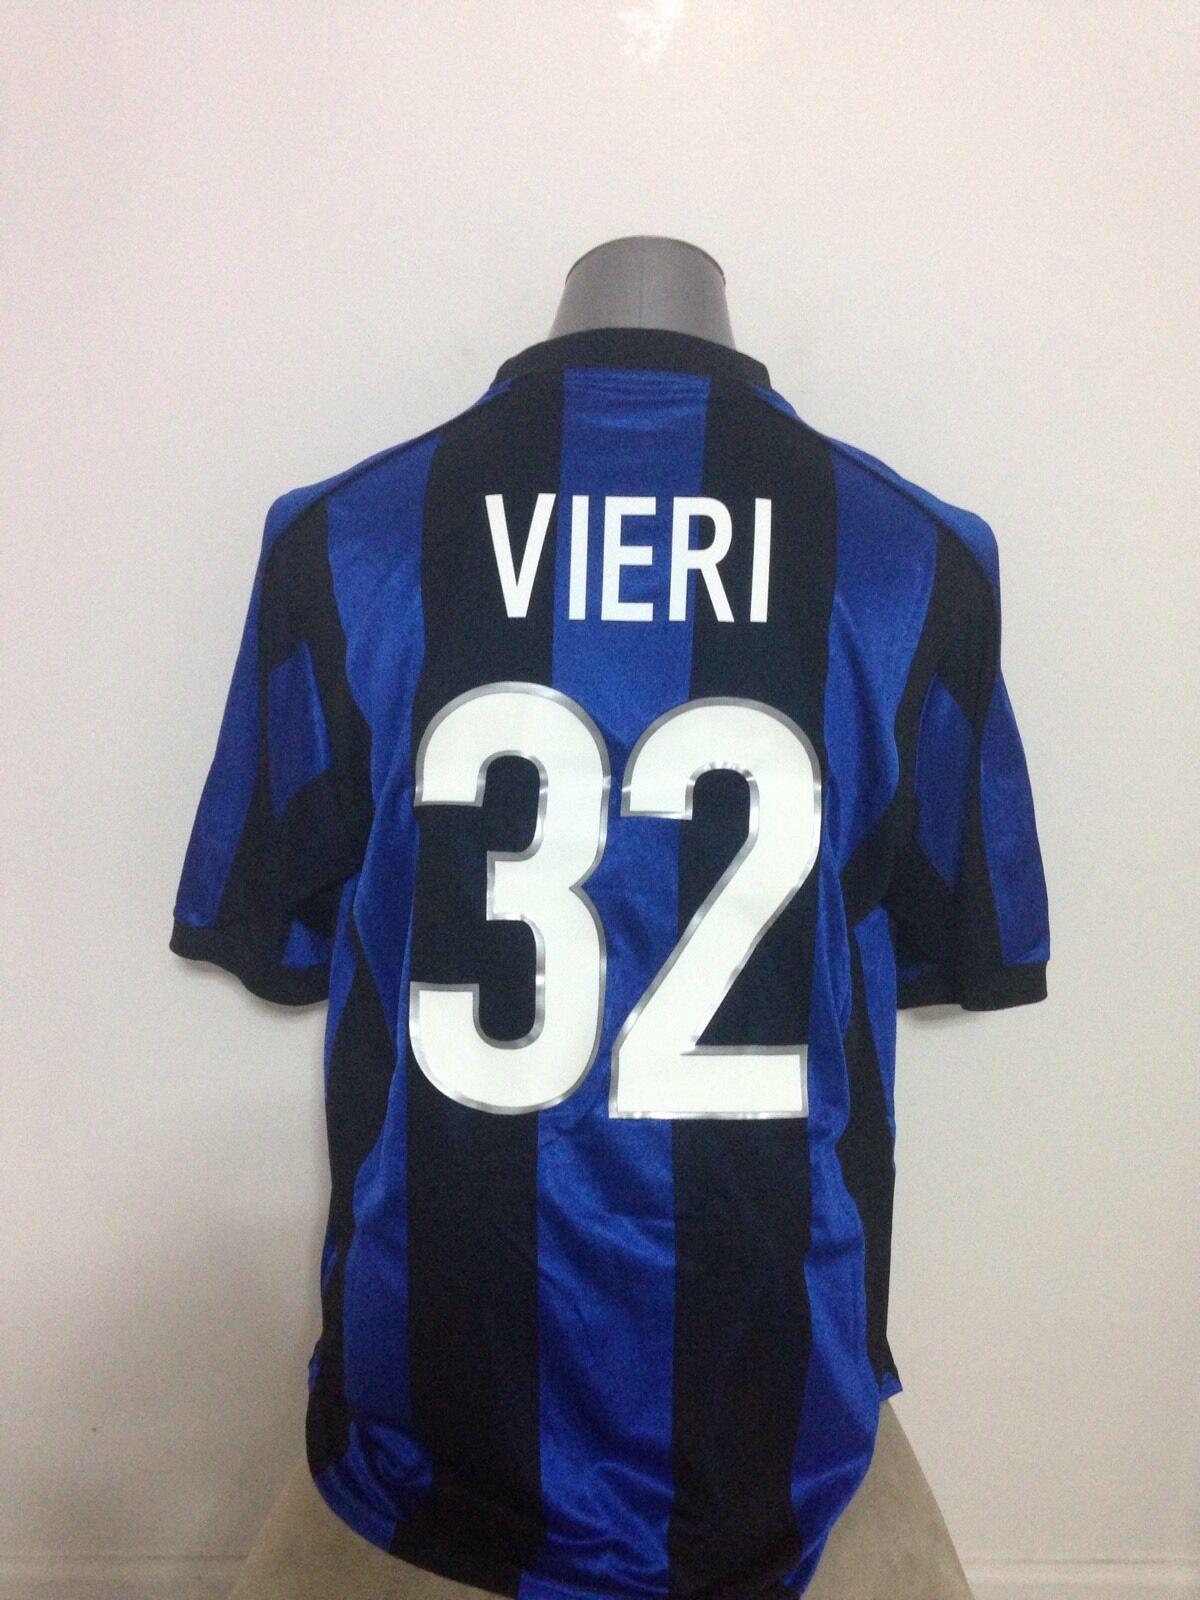 19992000 Inter Milan Vieri  32 Home Jersey L Lazio,Atletico Madrid,Milan,Juve